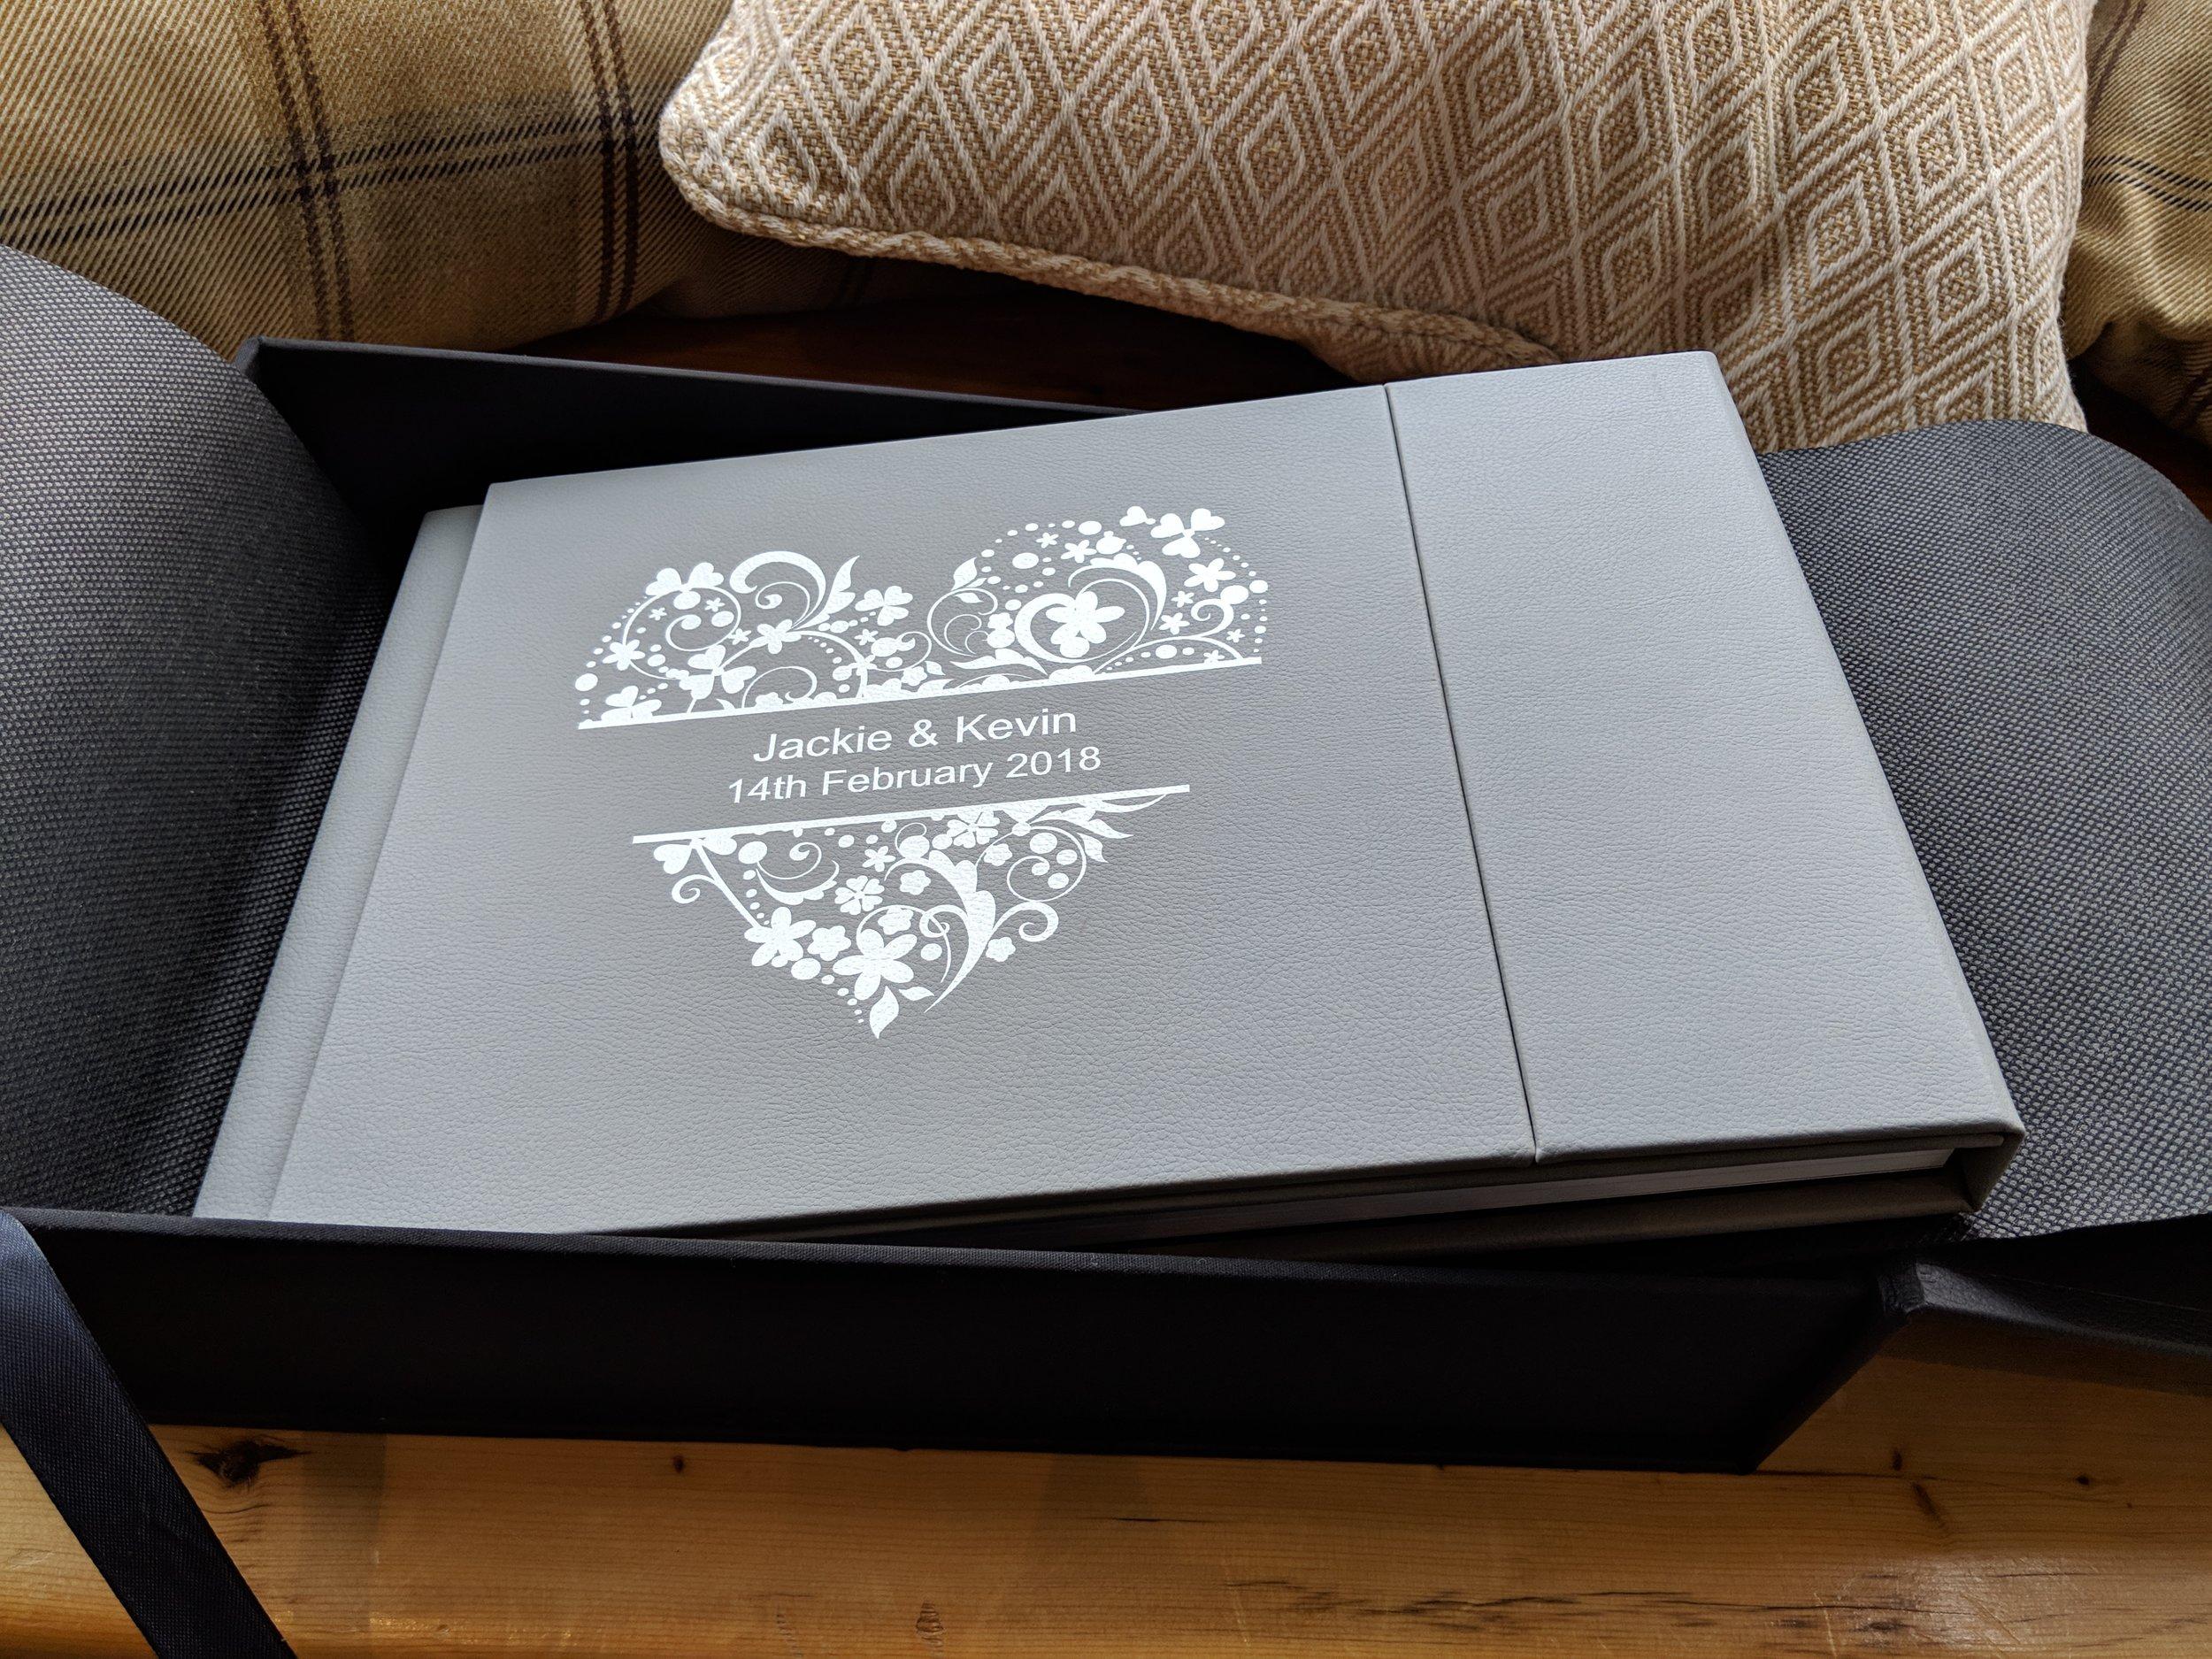 wedding-photography-album-bellissimo-perfetto-jackie-kevin-5.jpg